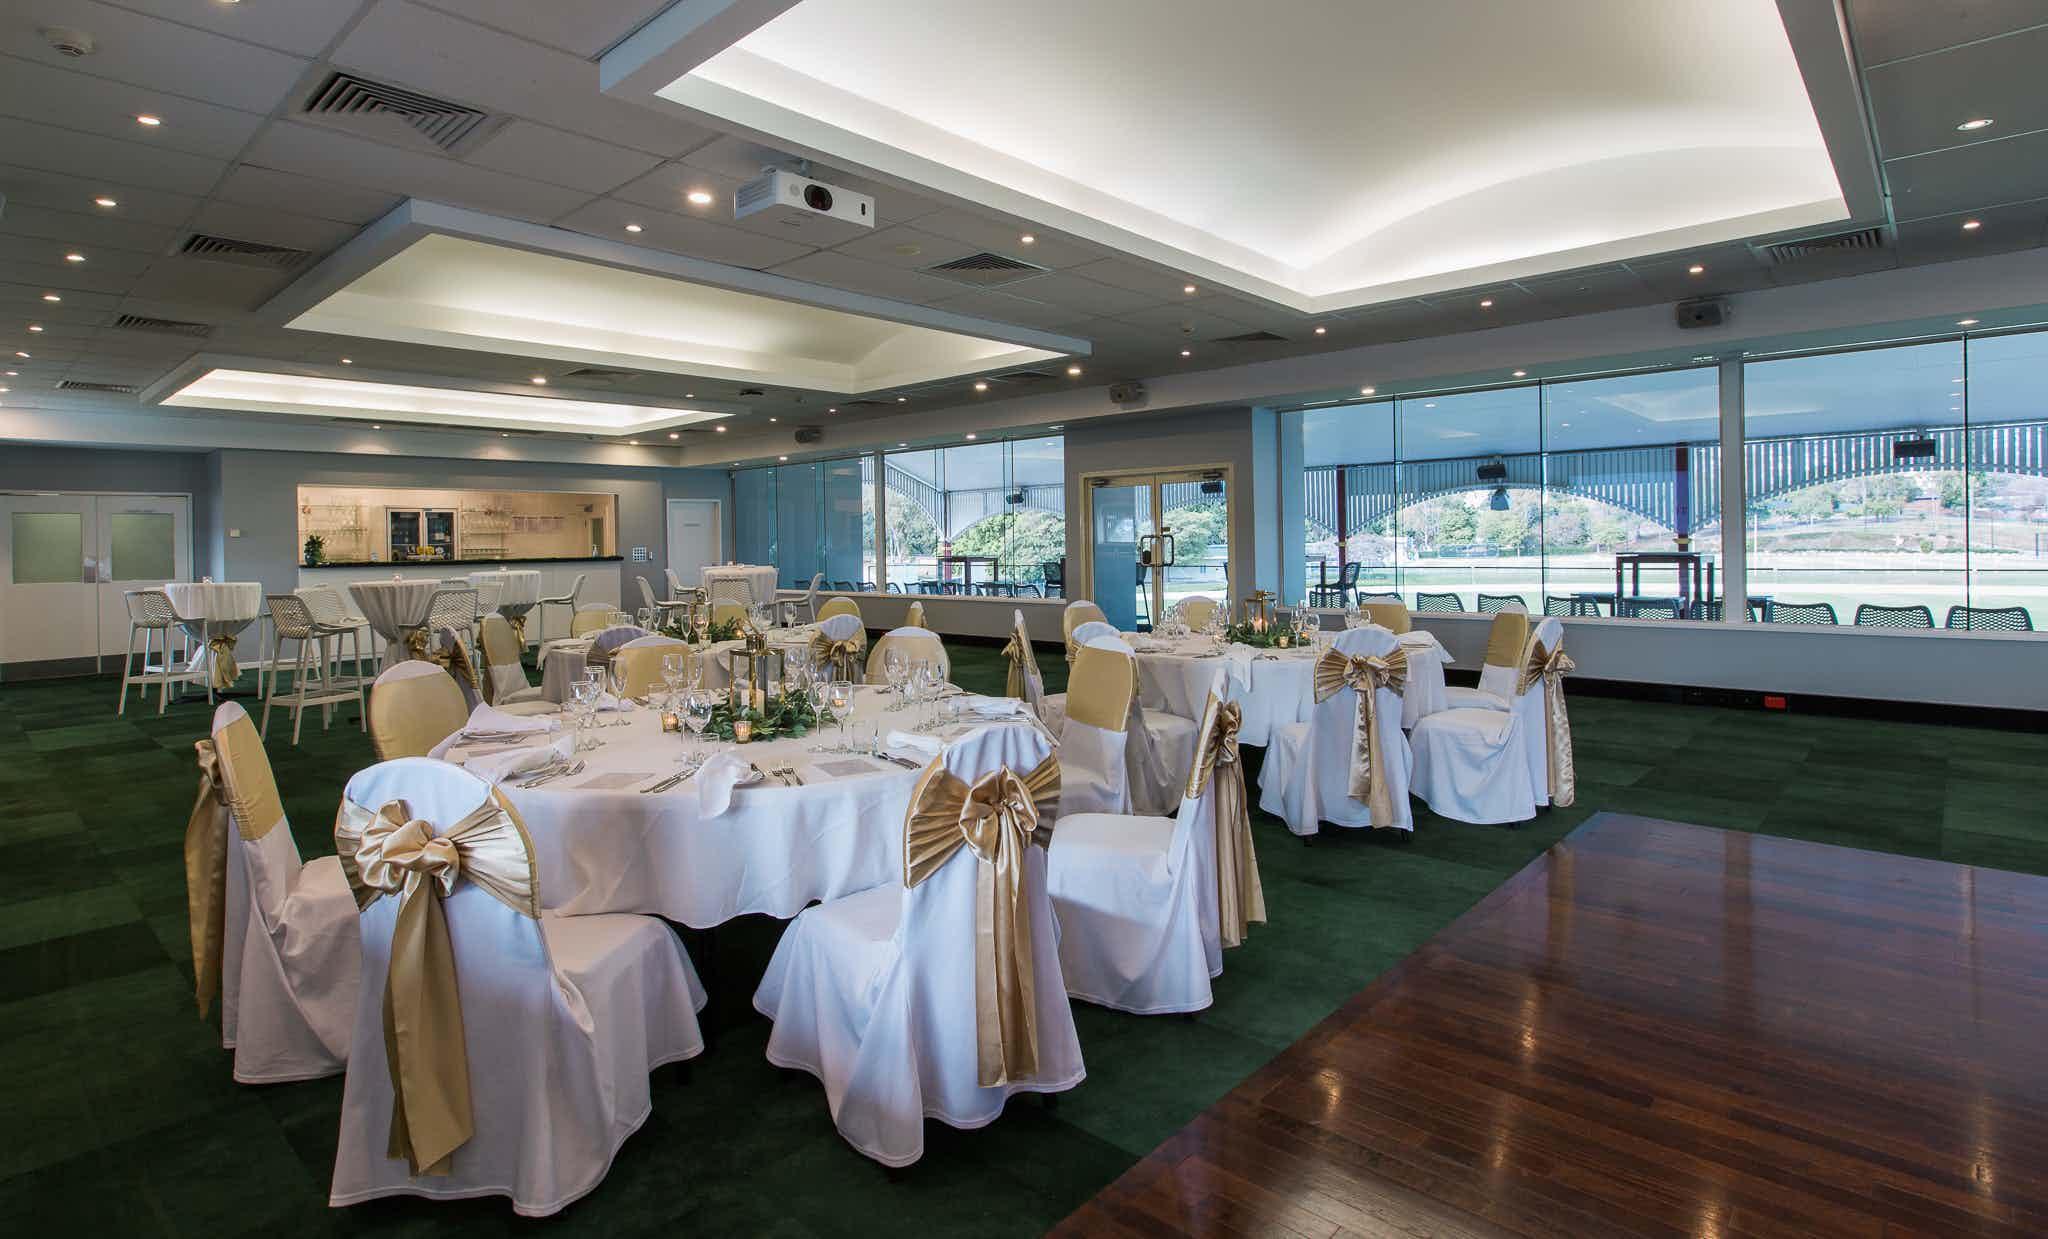 Century Room, The Pavilions